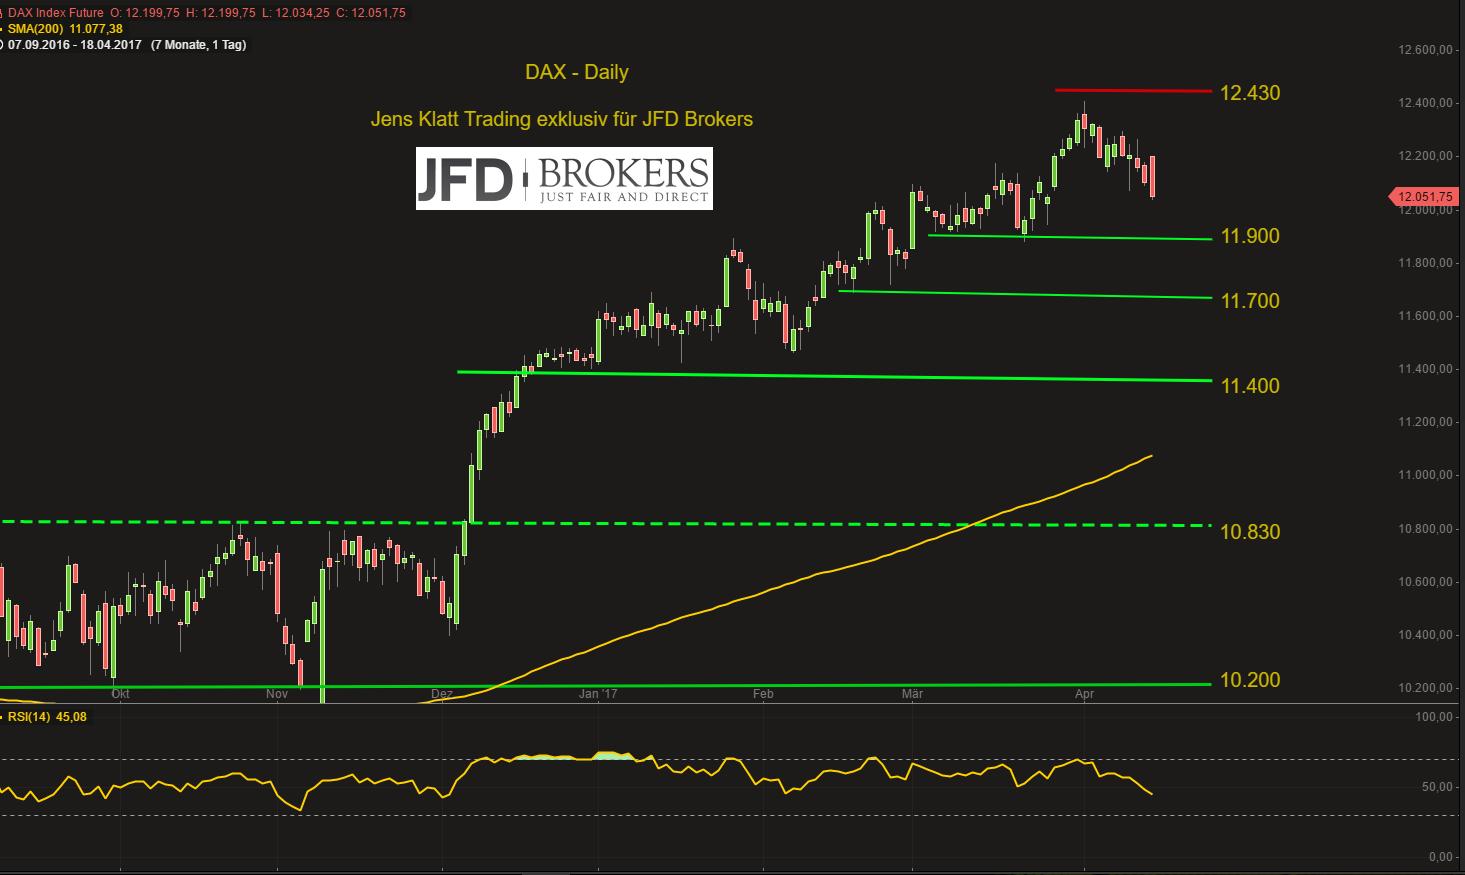 DAX-startet-verkatert-aus-dem-Oster-Wochenende-12-000er-Marke-im-Fokus-Kommentar-JFD-Brokers-GodmodeTrader.de-2